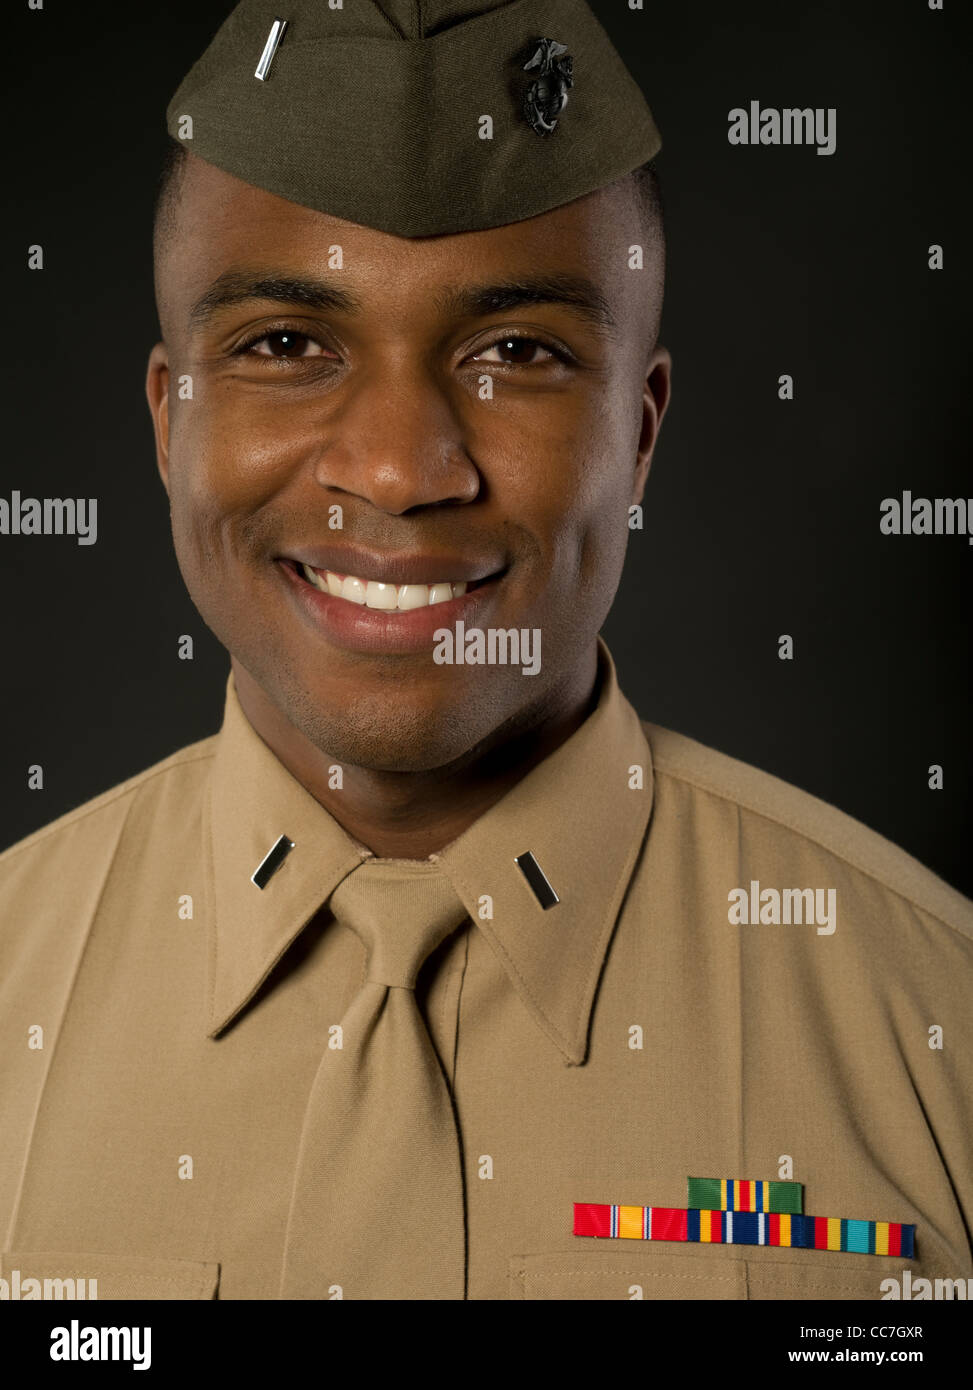 united states marine corps officer in service b bravos uniform stock photo 41963567 alamy. Black Bedroom Furniture Sets. Home Design Ideas